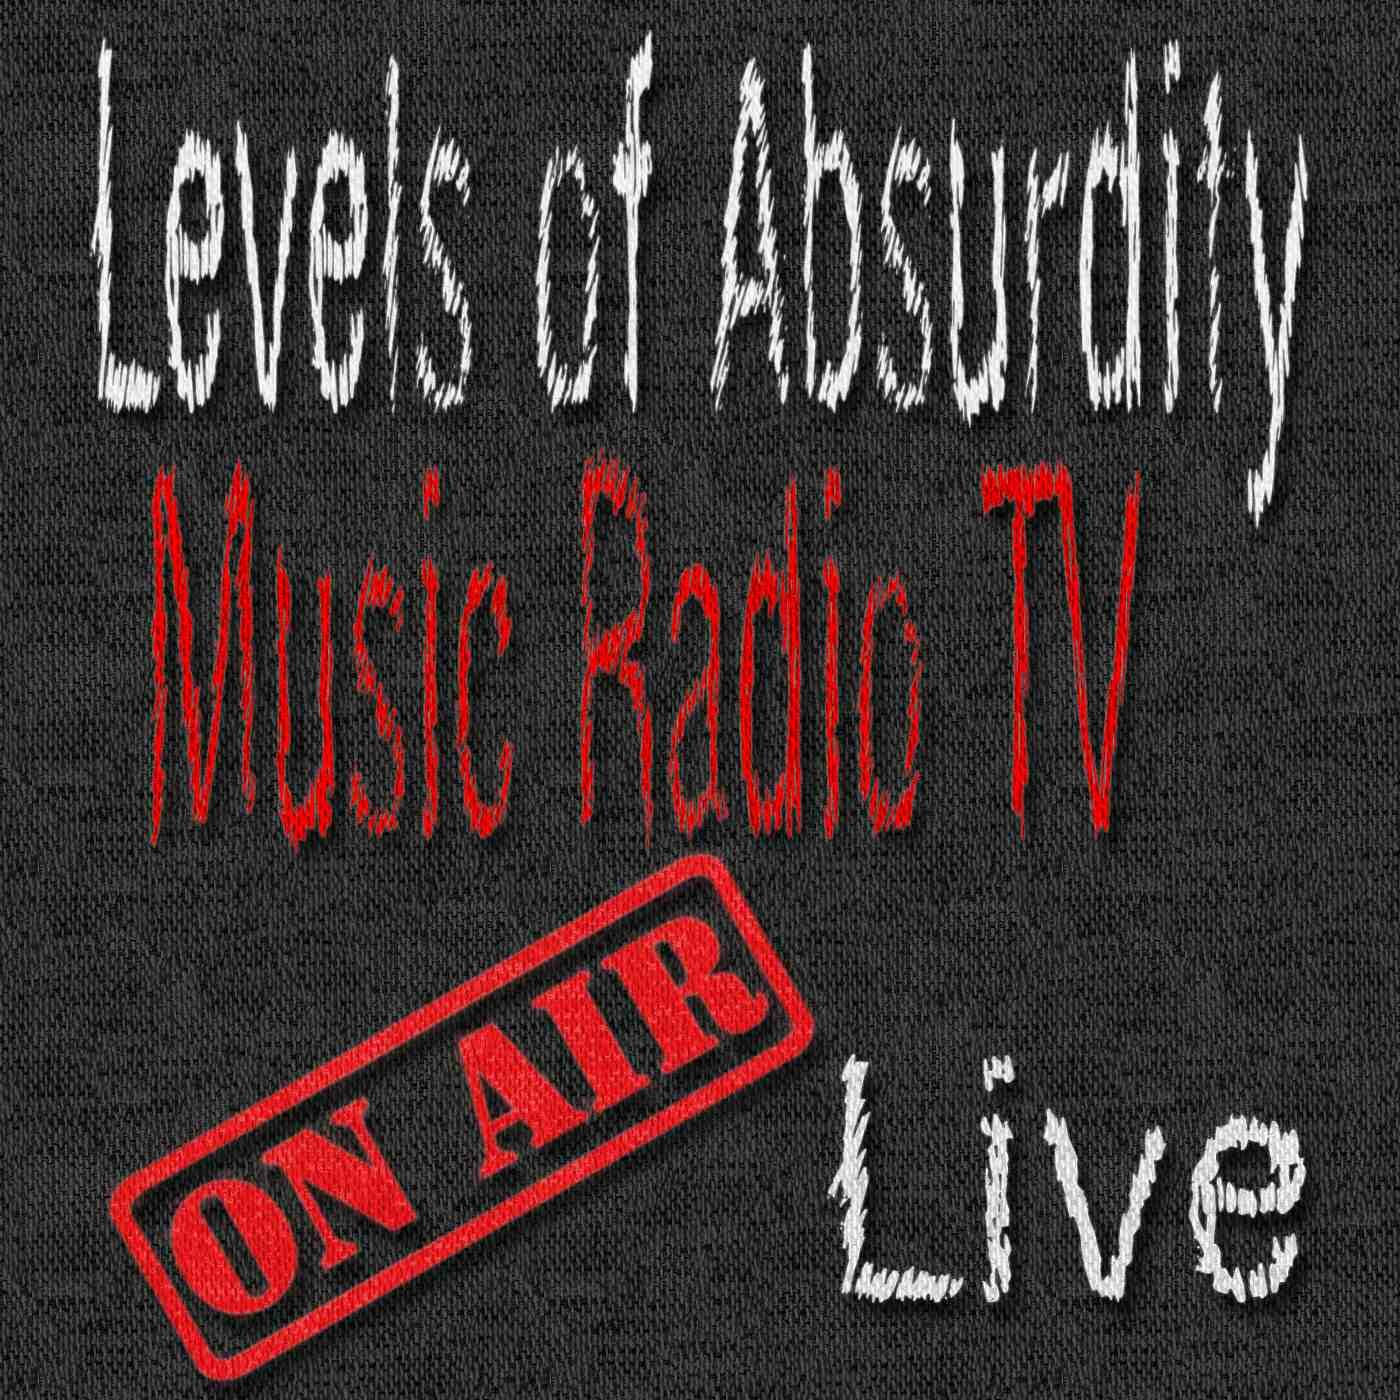 Levels of Absurdity Music RadioTV